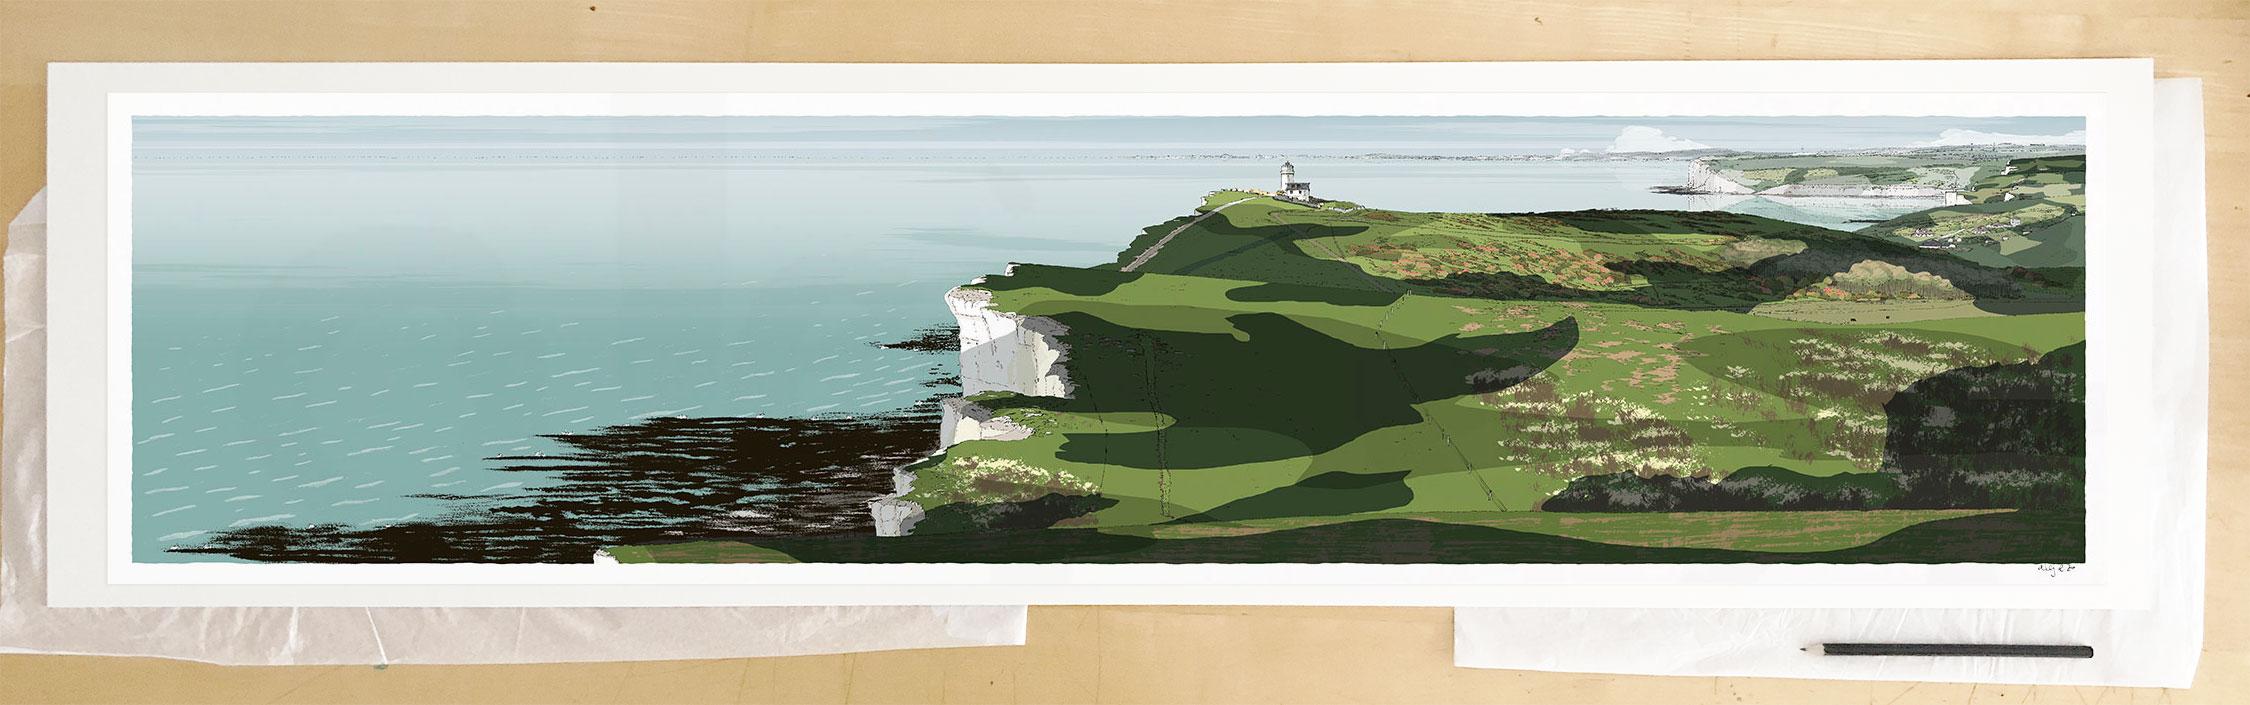 Fine art print by UK artist alej ez titled South Downs Way Belle Tout Lighthouse Beachy Head